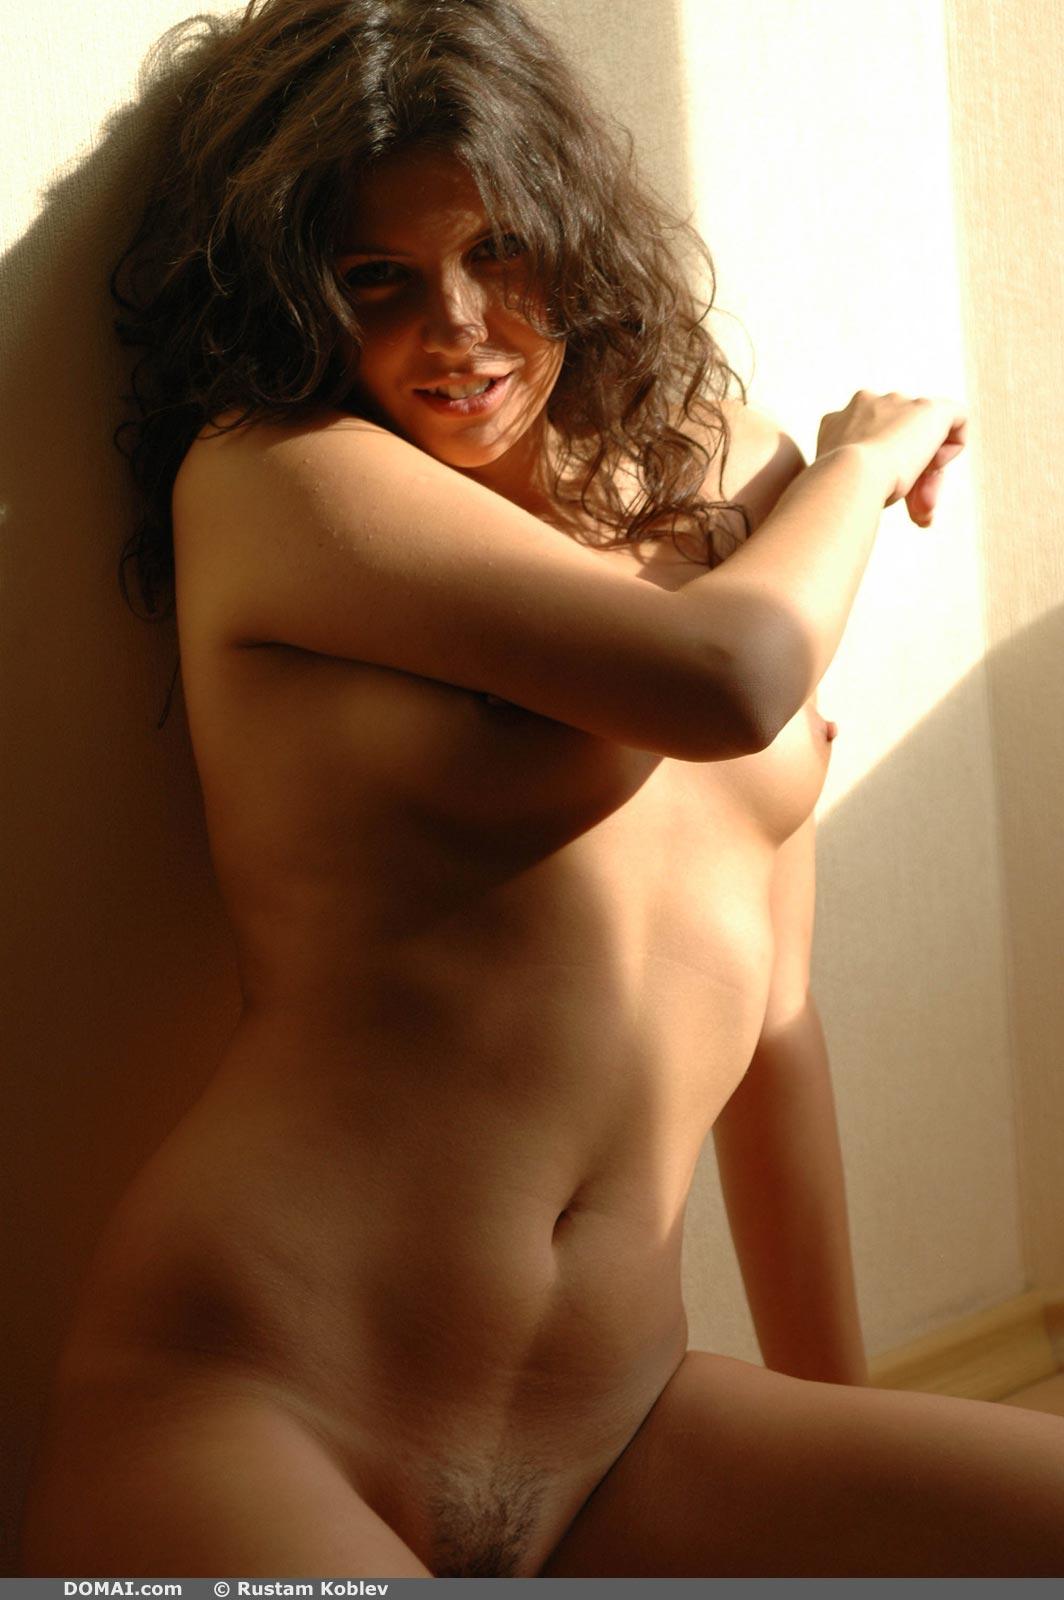 irisa in shadow nudespuri com